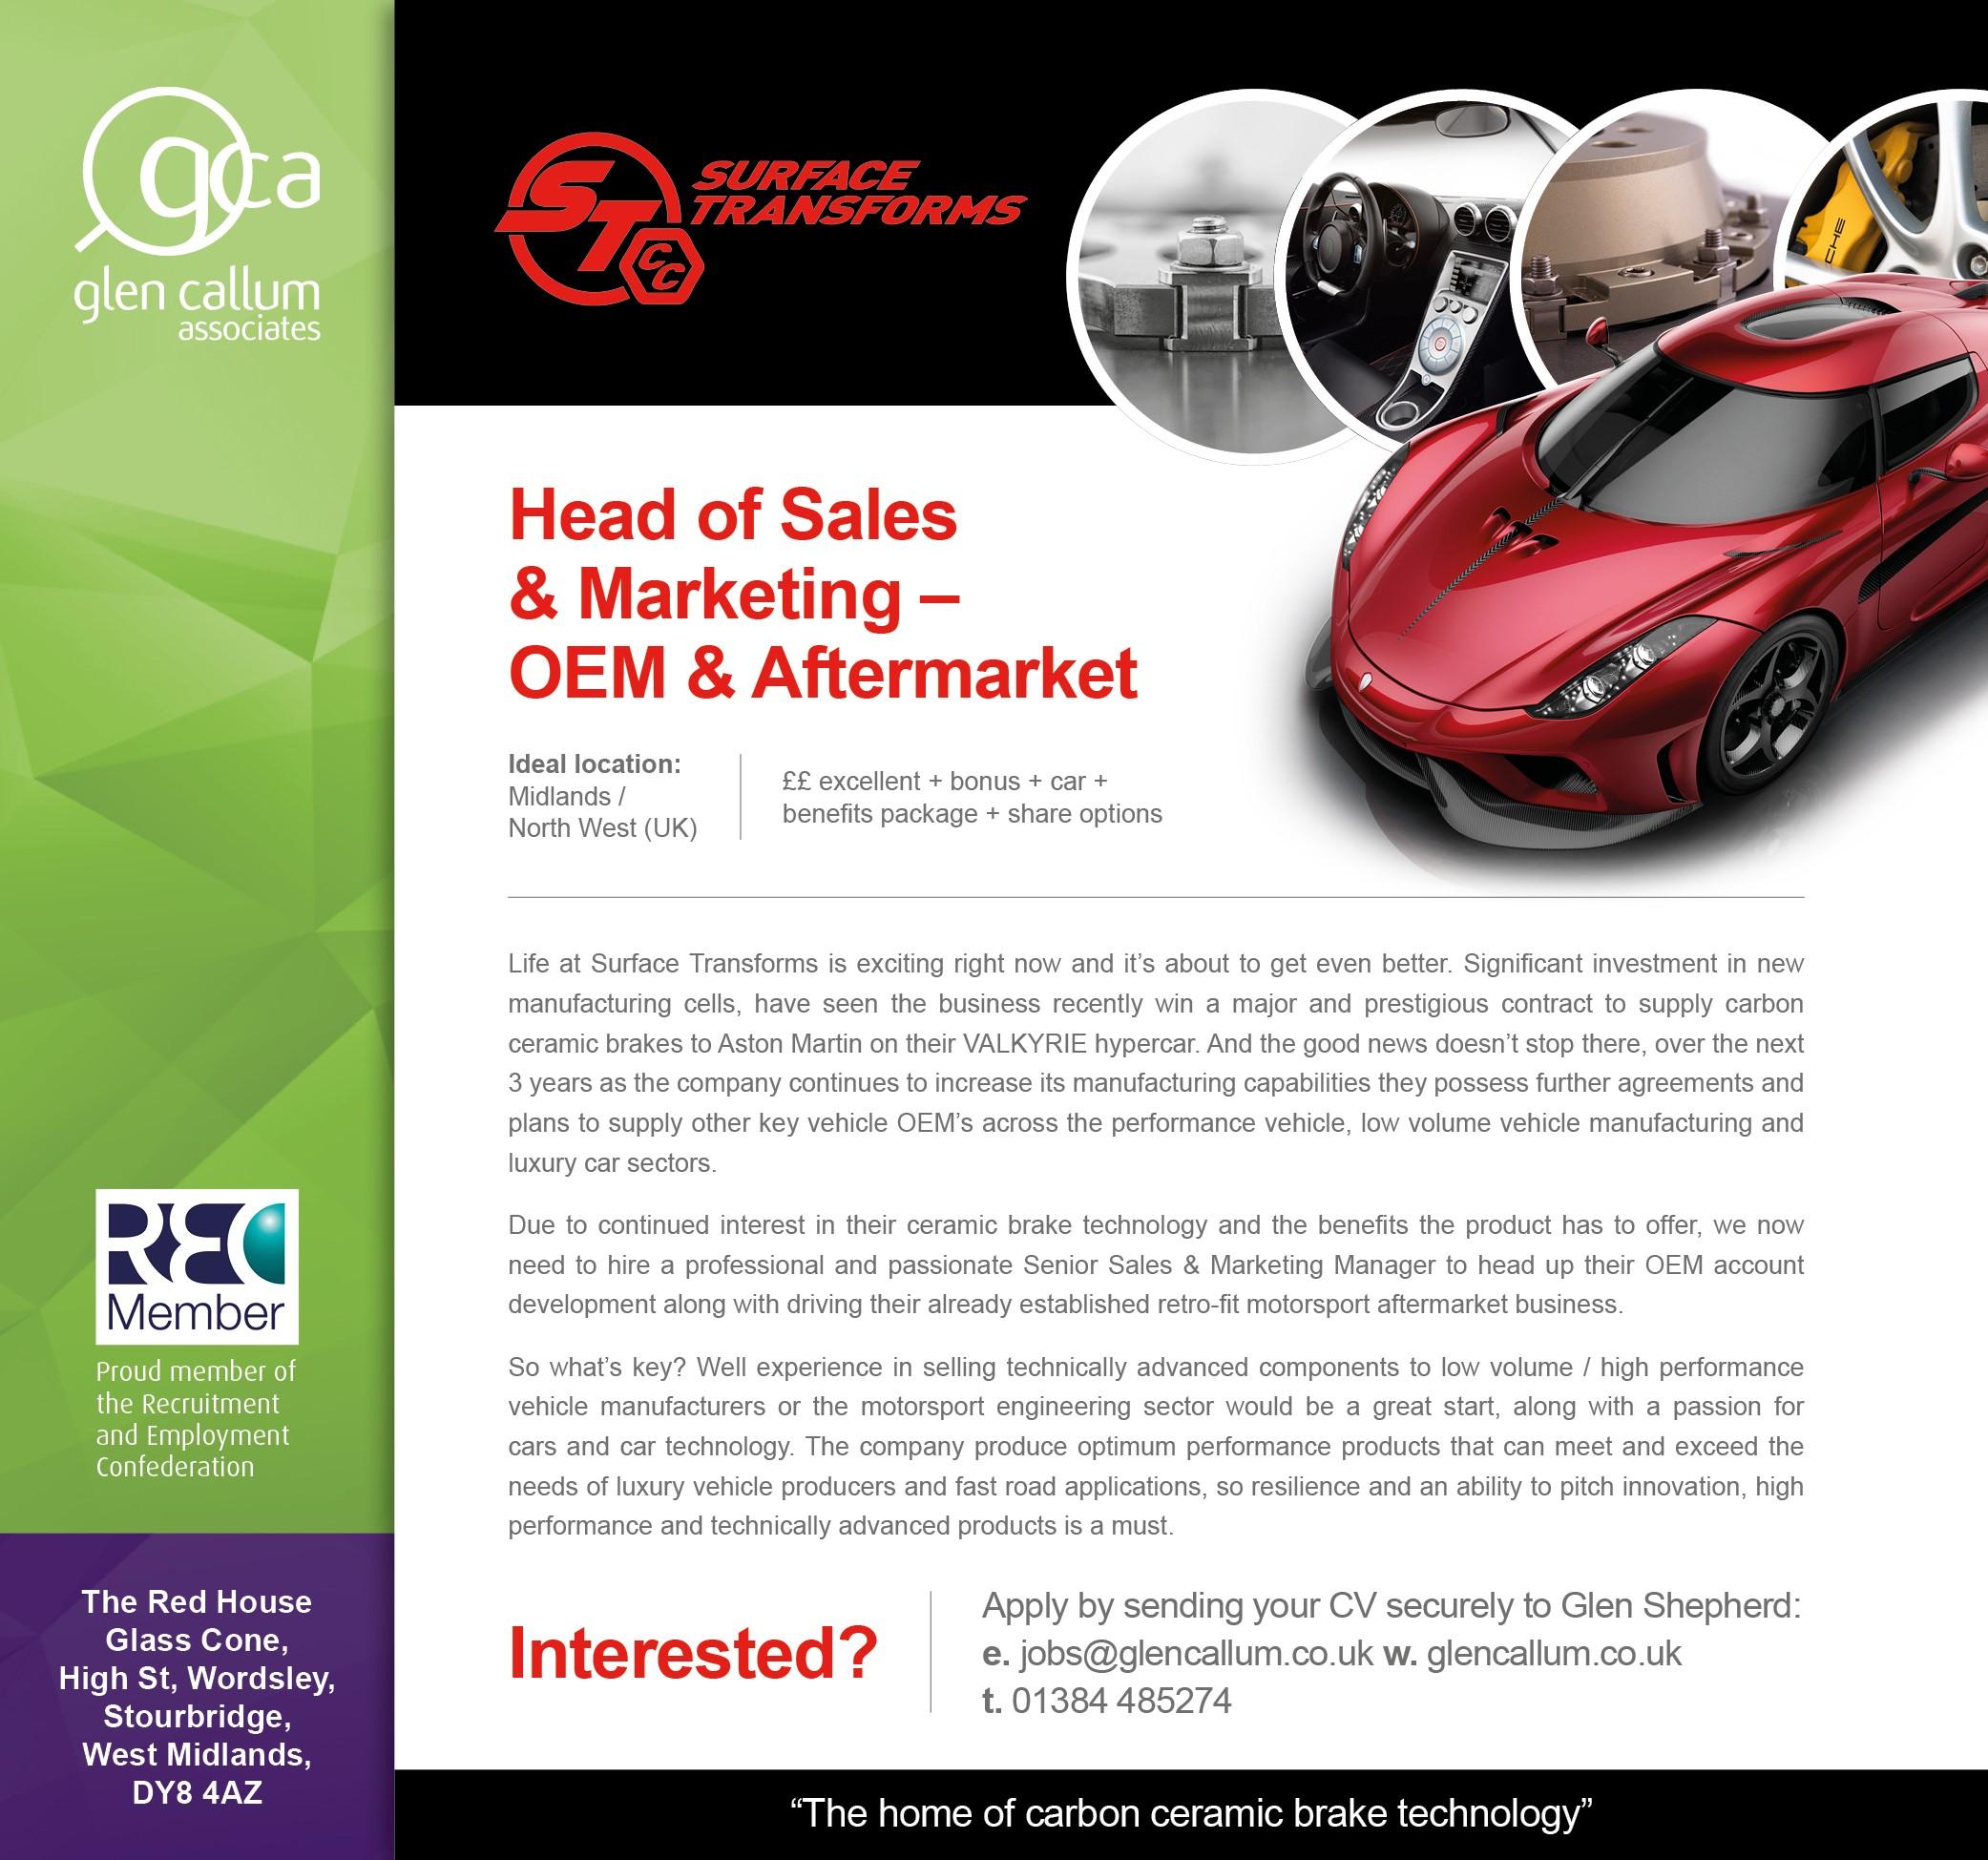 Automotive Diagnostics Jobs On The Increase Automotive Diagnostics Jobs On The Increase